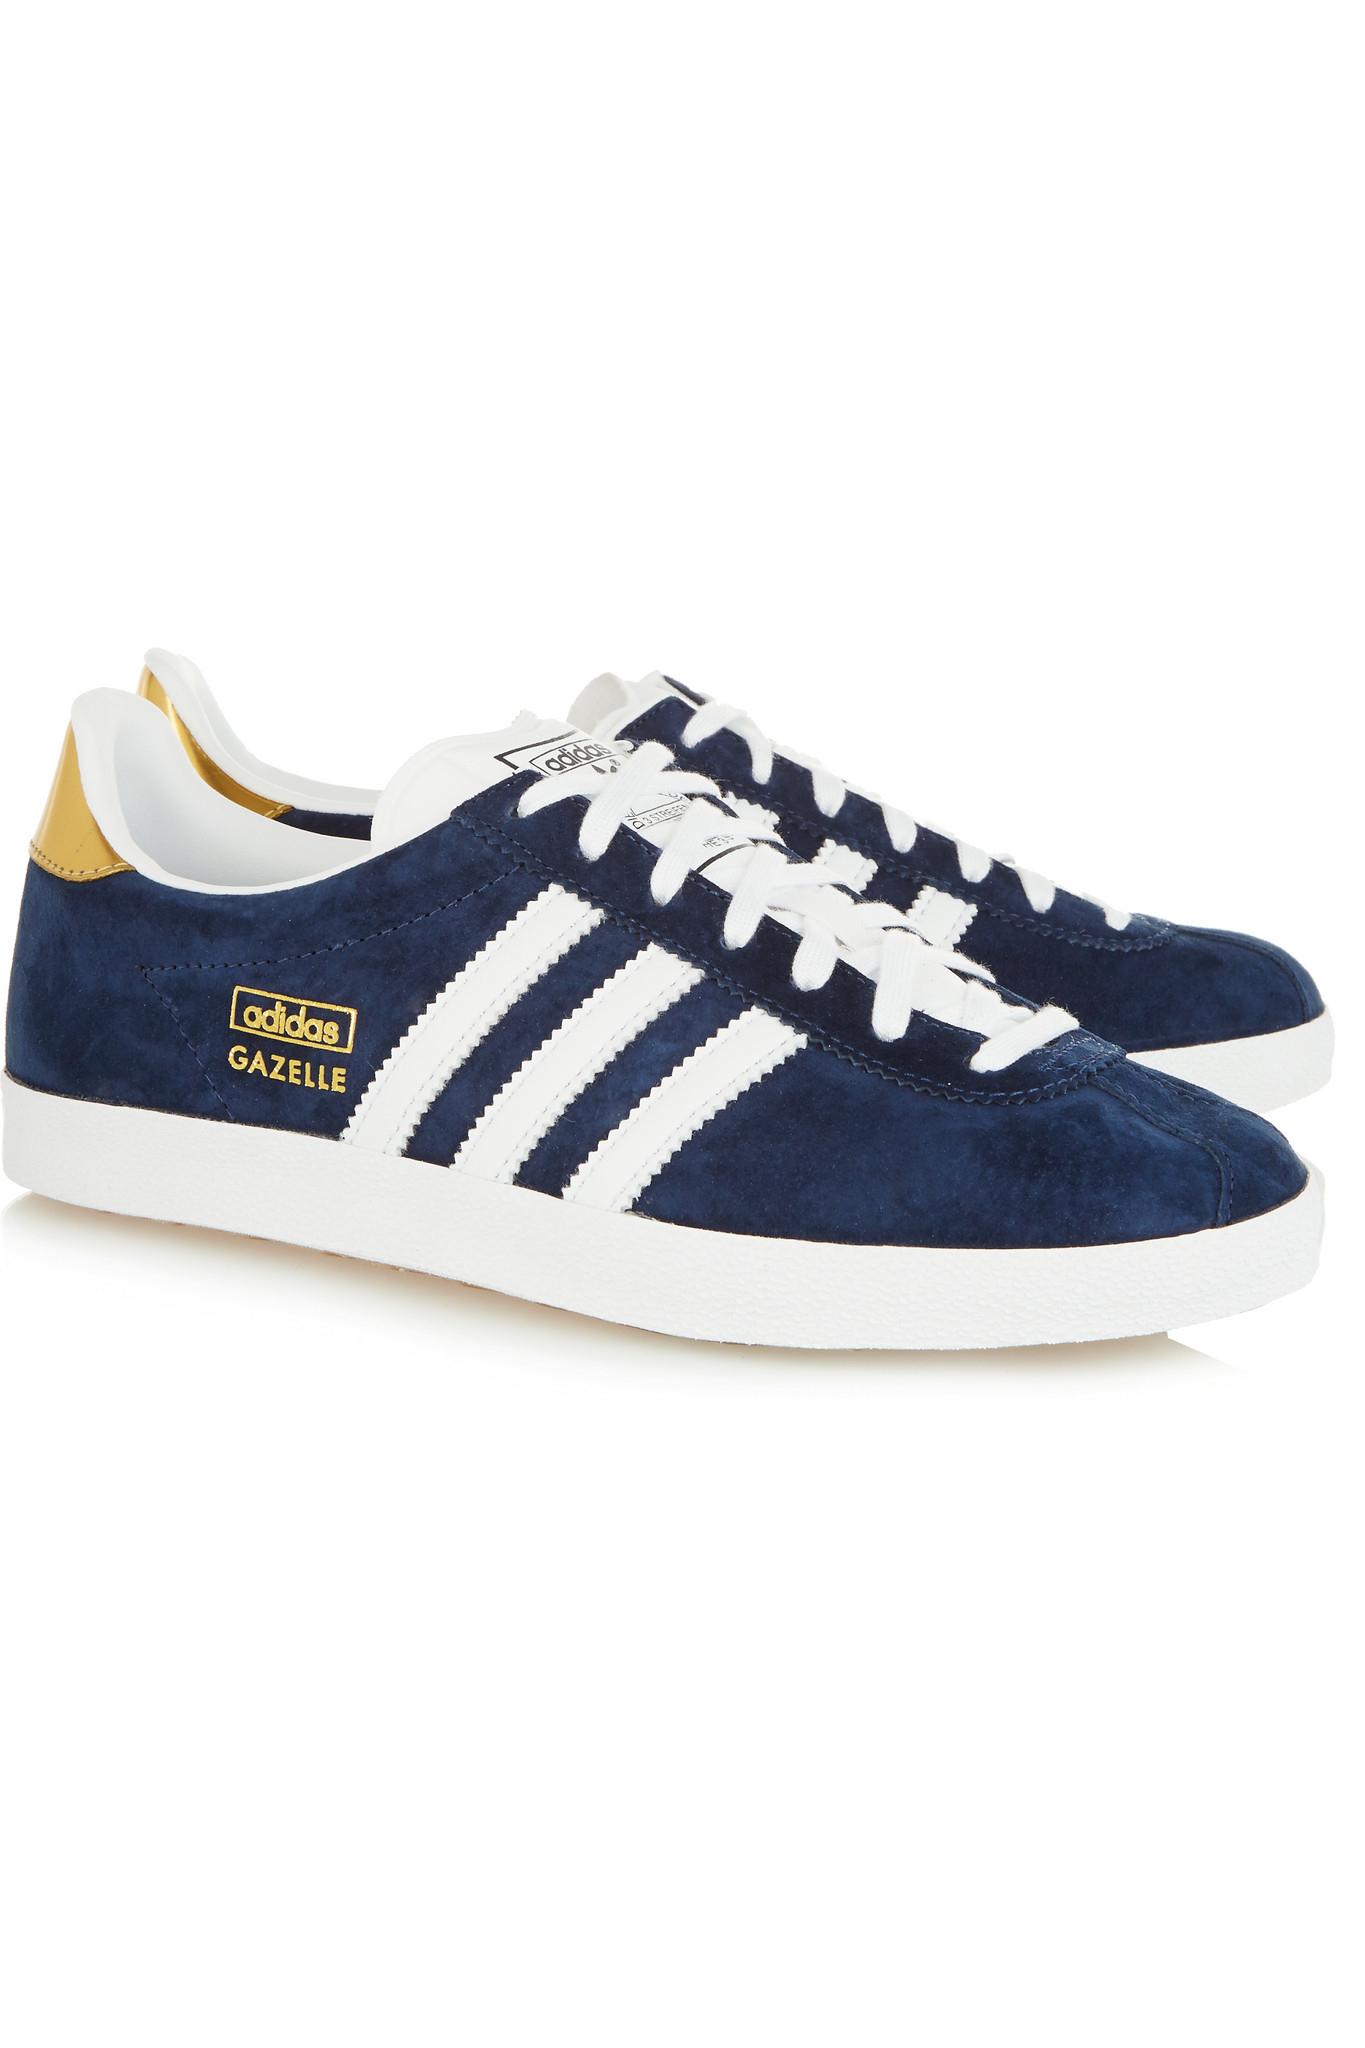 Adidas Originals Gazelle Dg Suede Sneakers in Blue - Lyst